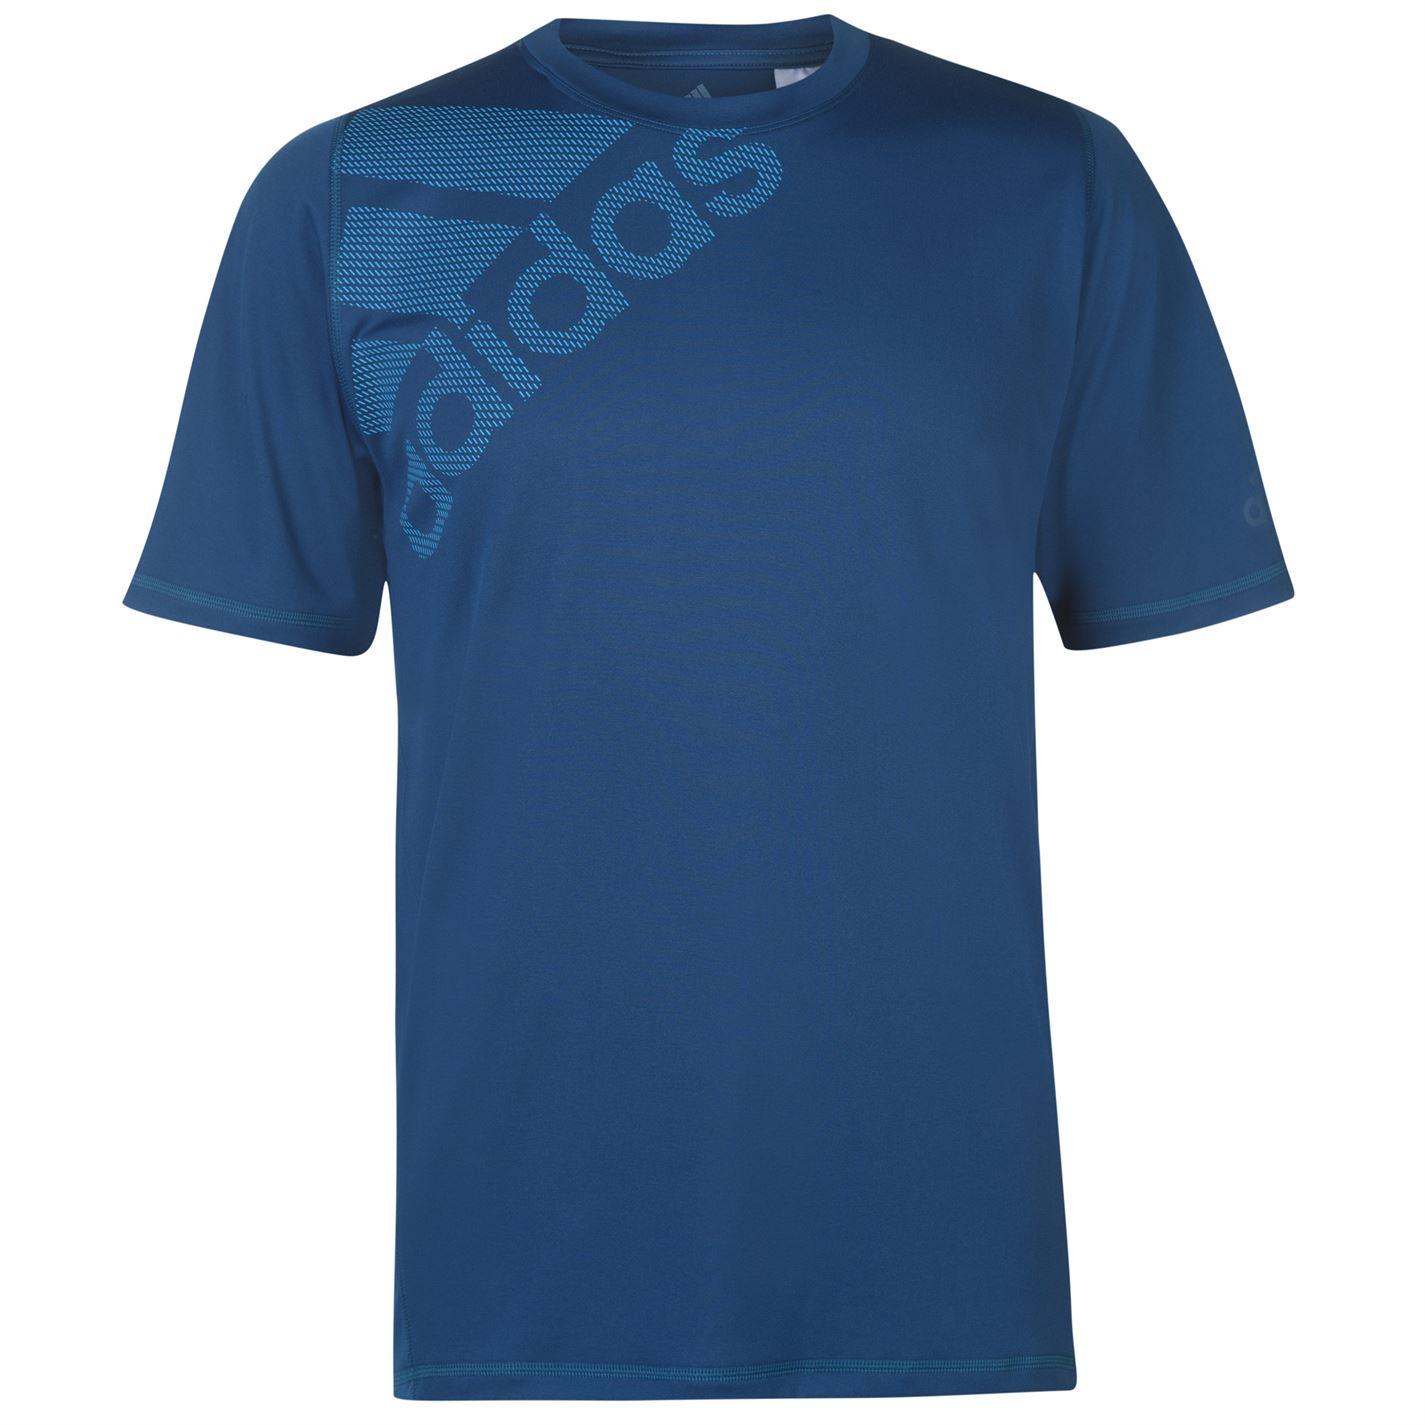 Adidas Freelift Badge Of Sport Training T Shirt Mens